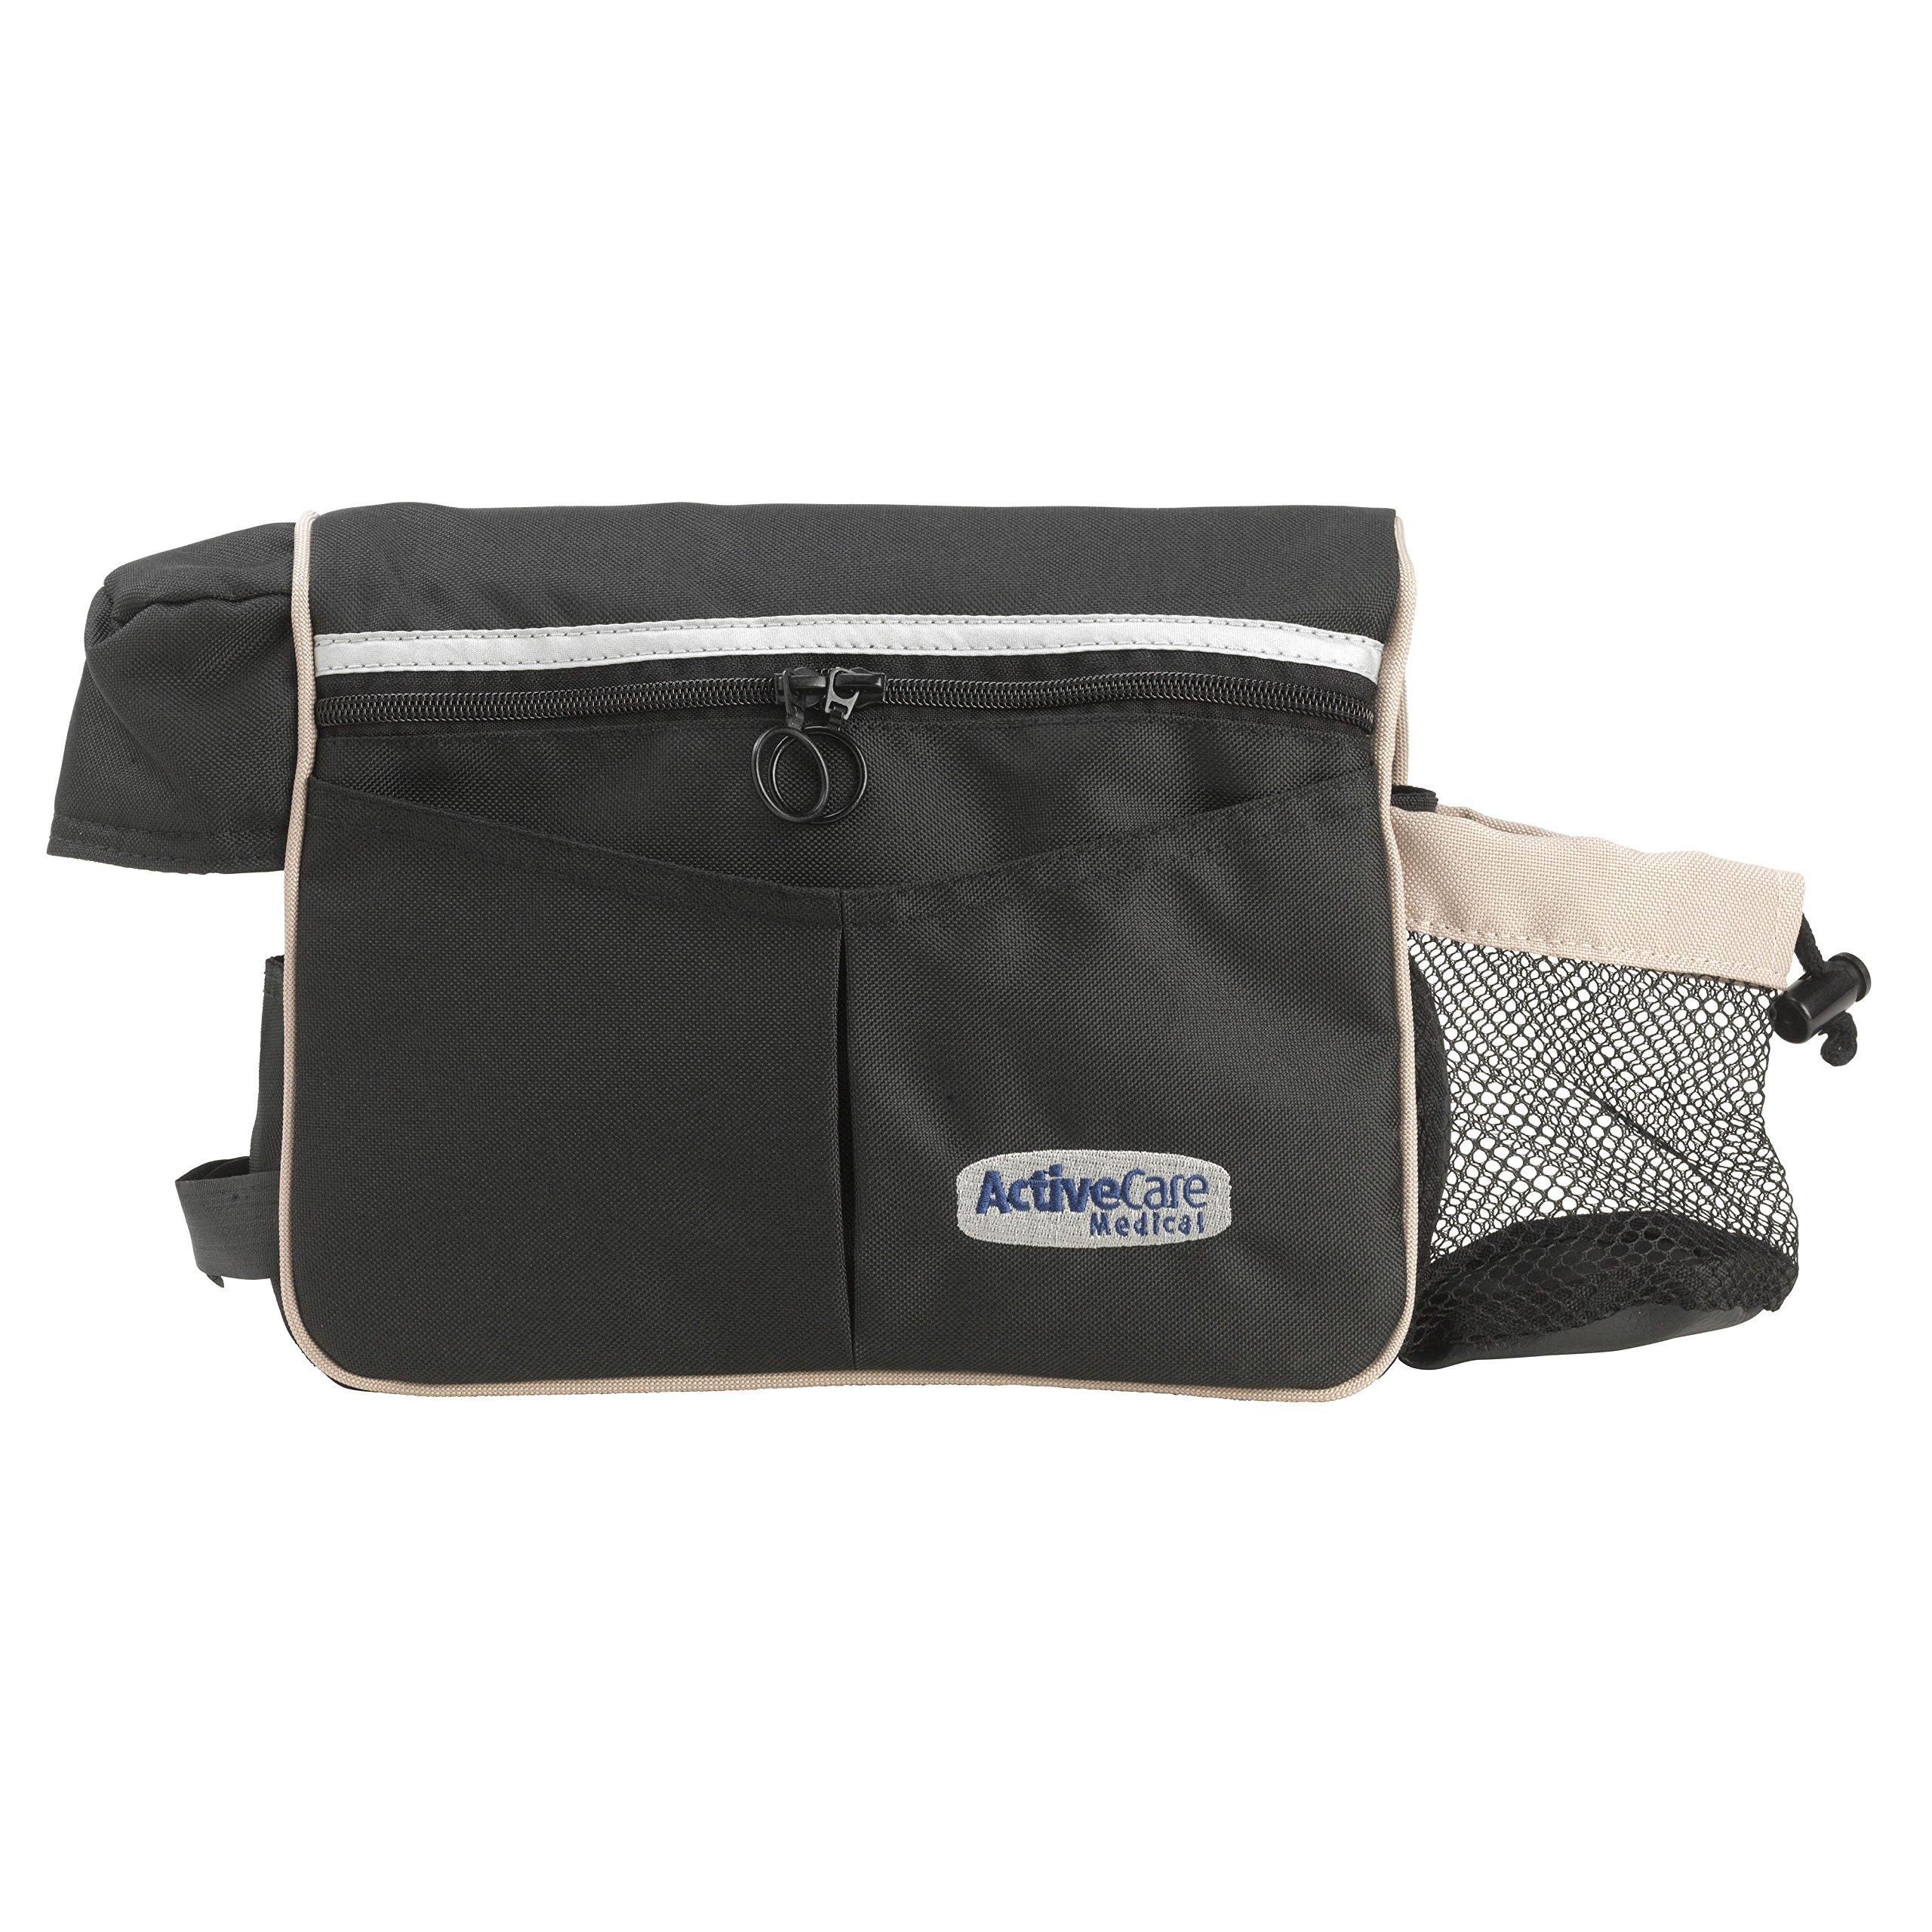 Drive Medical Power Mobility Armrest Bag, Medical Scooters